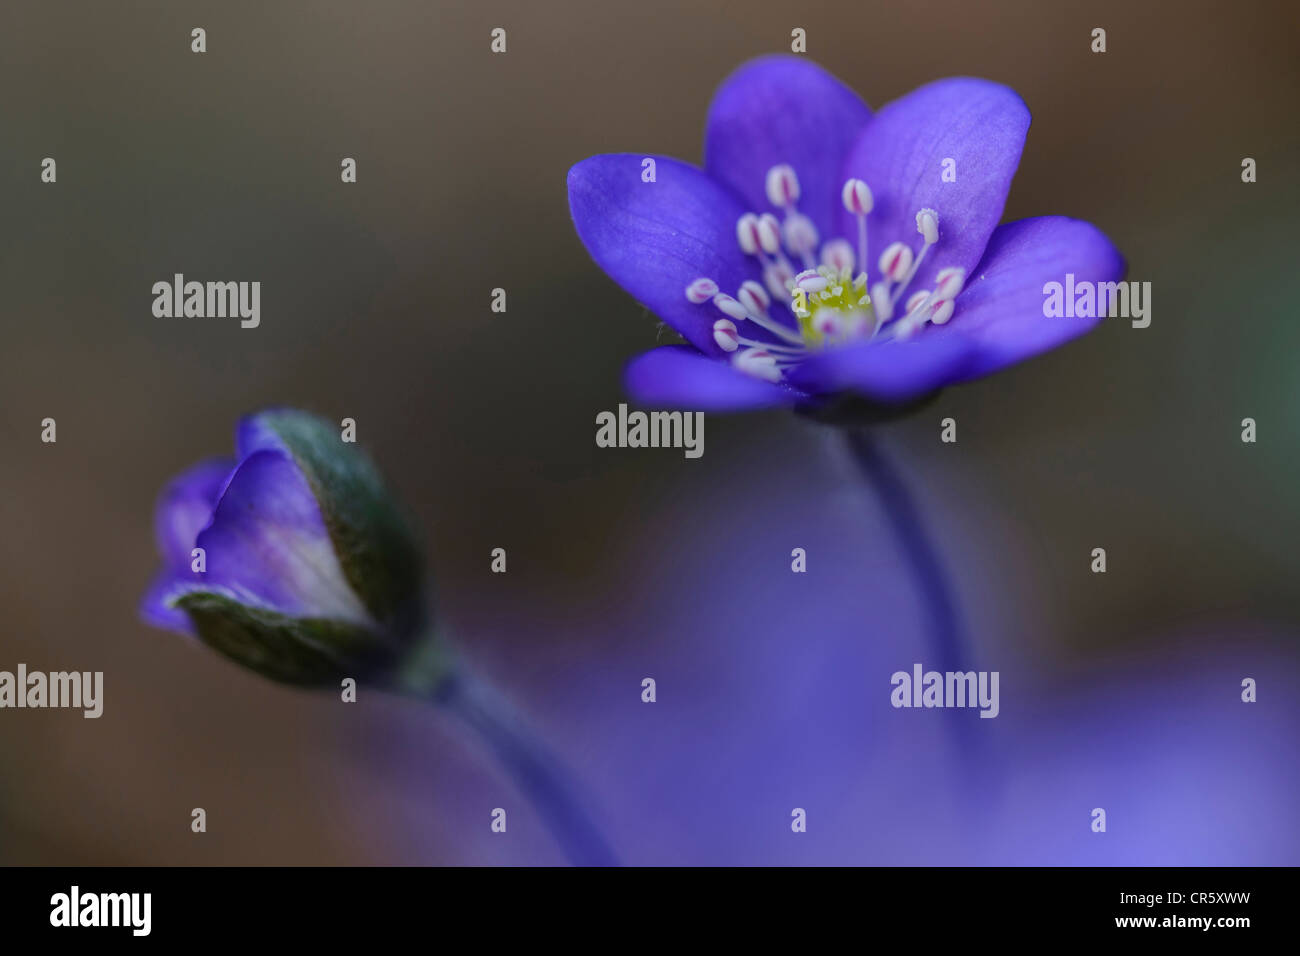 Agrimonia (anemone hepatica), alemania Imagen De Stock